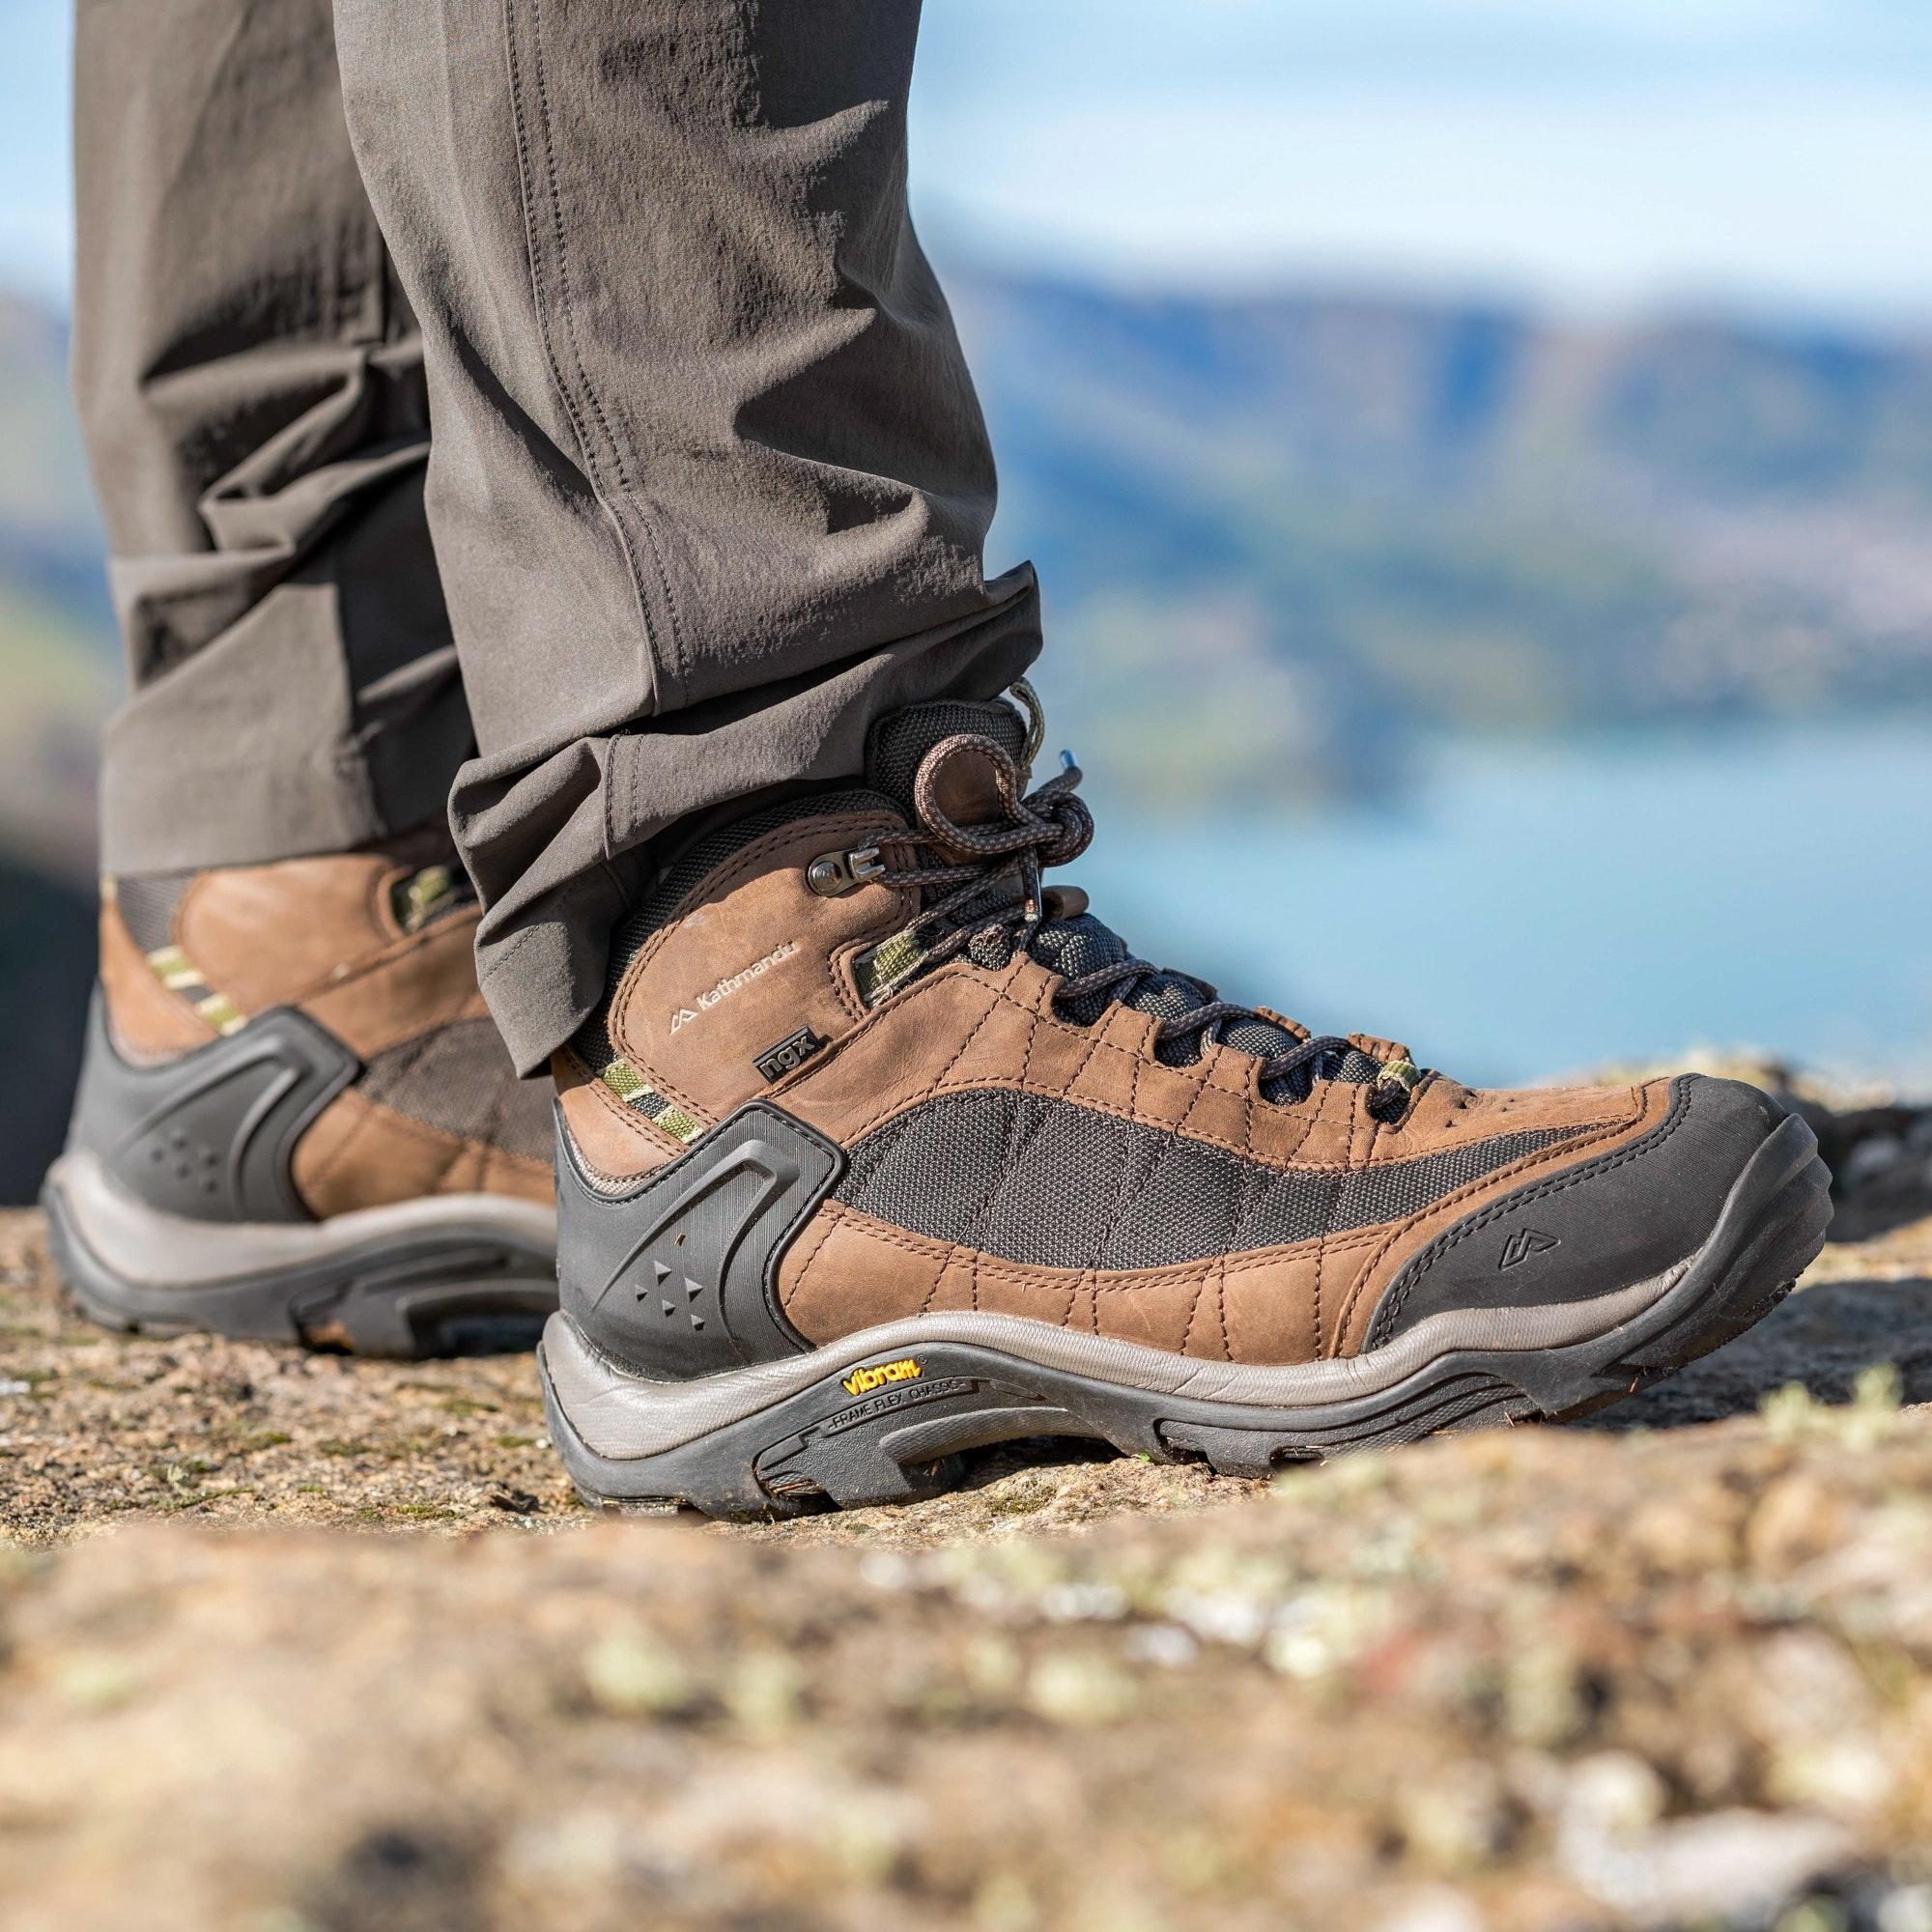 NEW-Kathmandu-Mornington-Mens-Vibram-Rubber-Waterproof-Lightweight-Hiking-Boots thumbnail 8